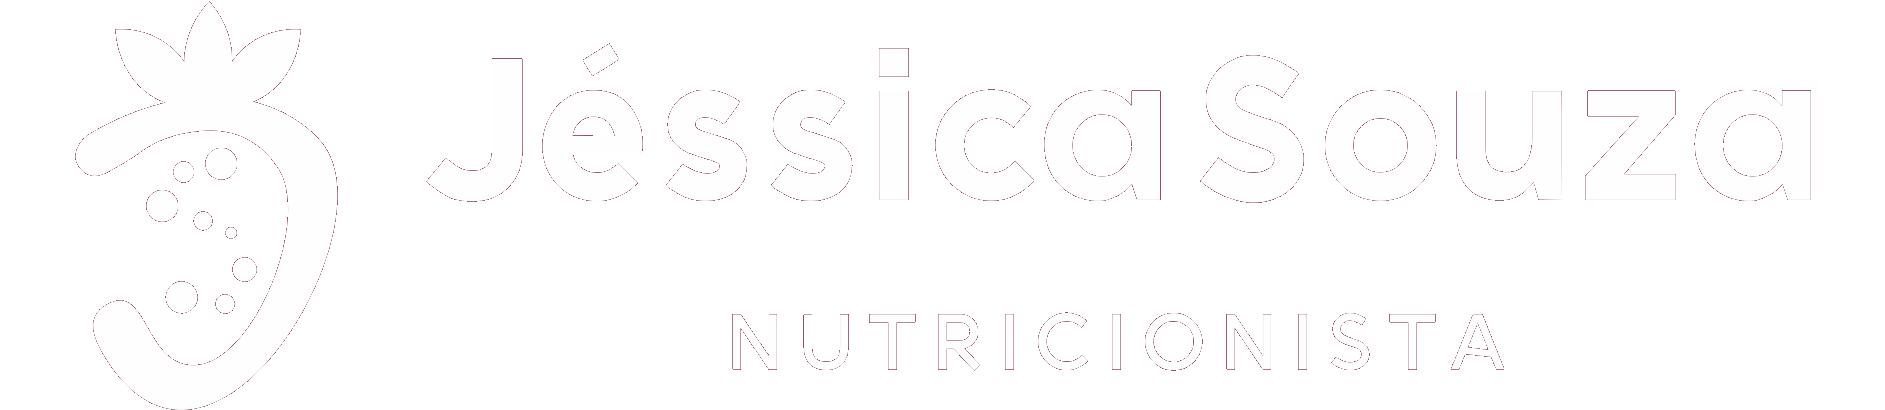 Logo Jessica Souza Nutricionista, Av Zelina, 1011, Vila Prudente, São Paulo, SP